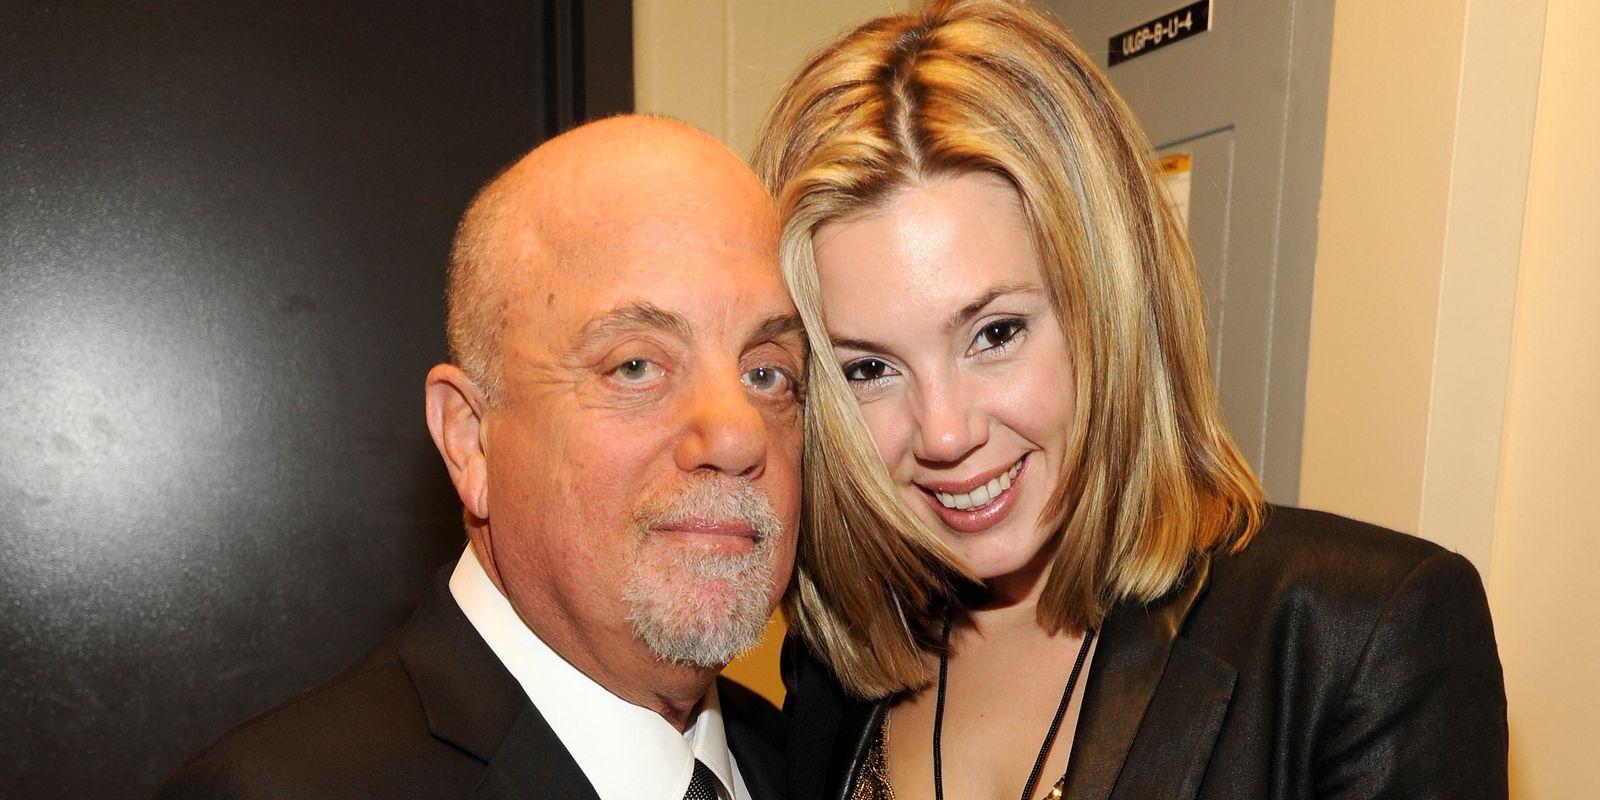 Billy Joel and wife Alexa